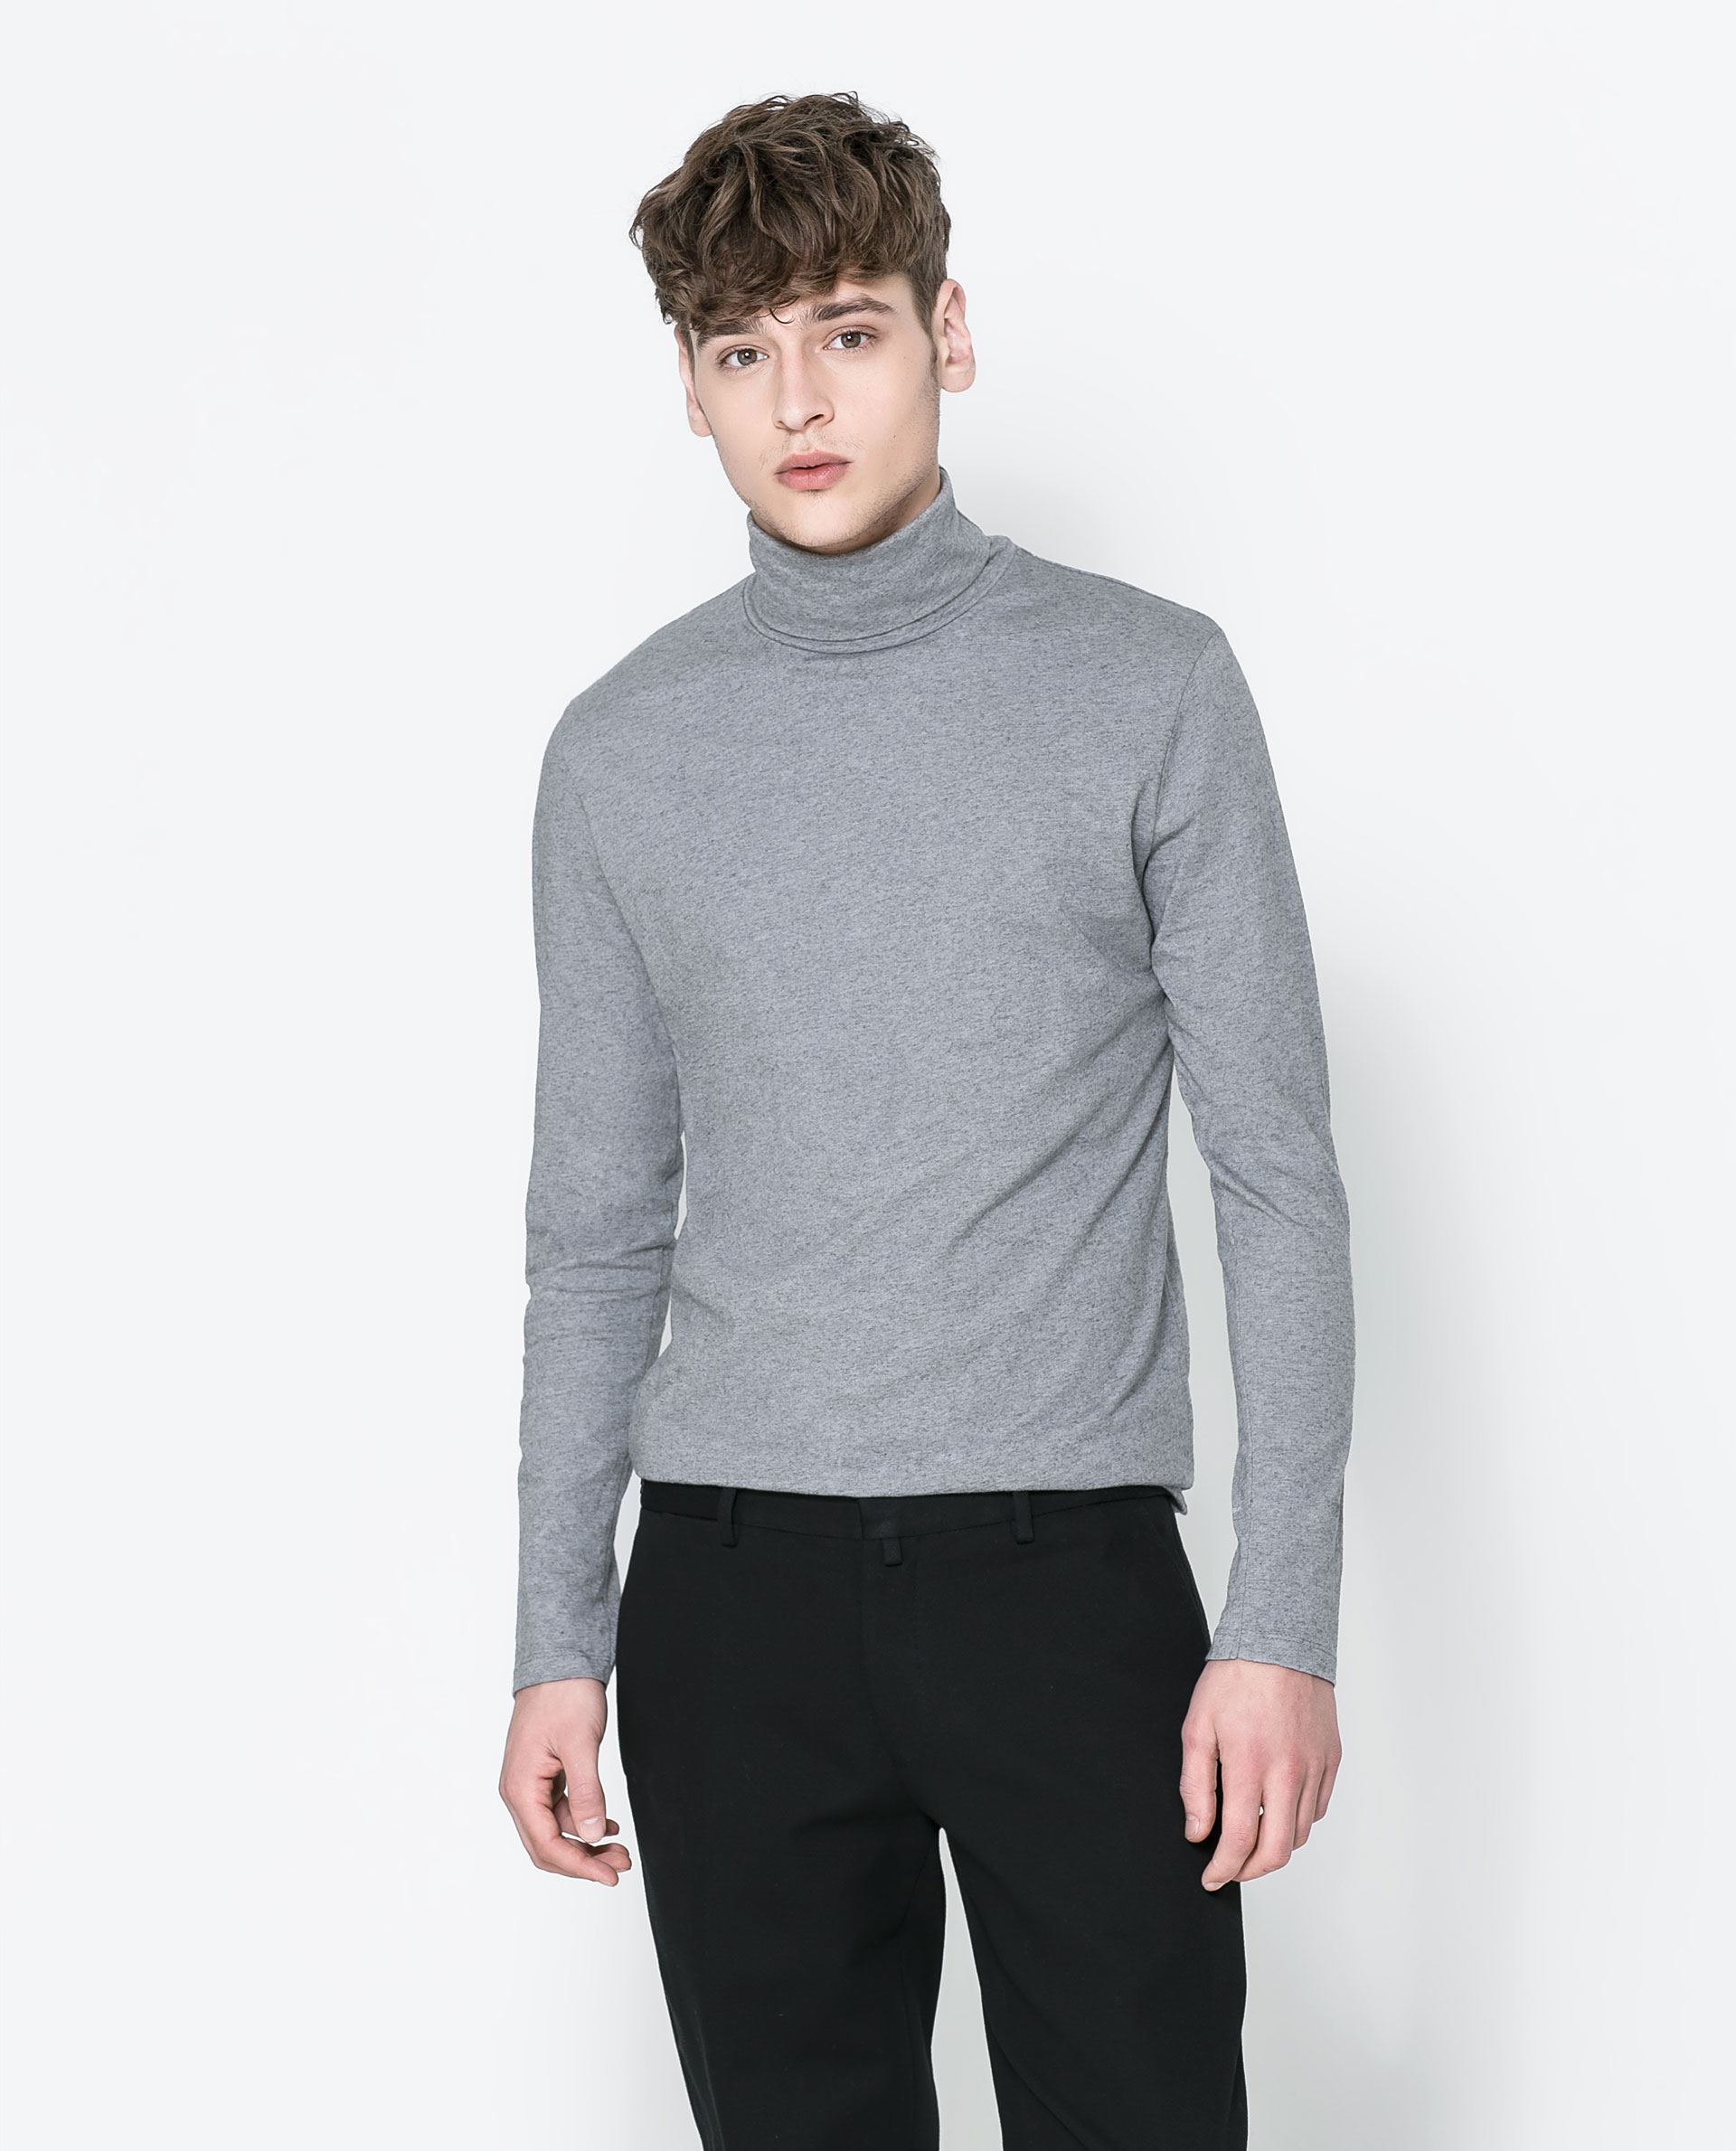 Zara turtleneck tshirt in gray for men lyst for Turtle shirts for men